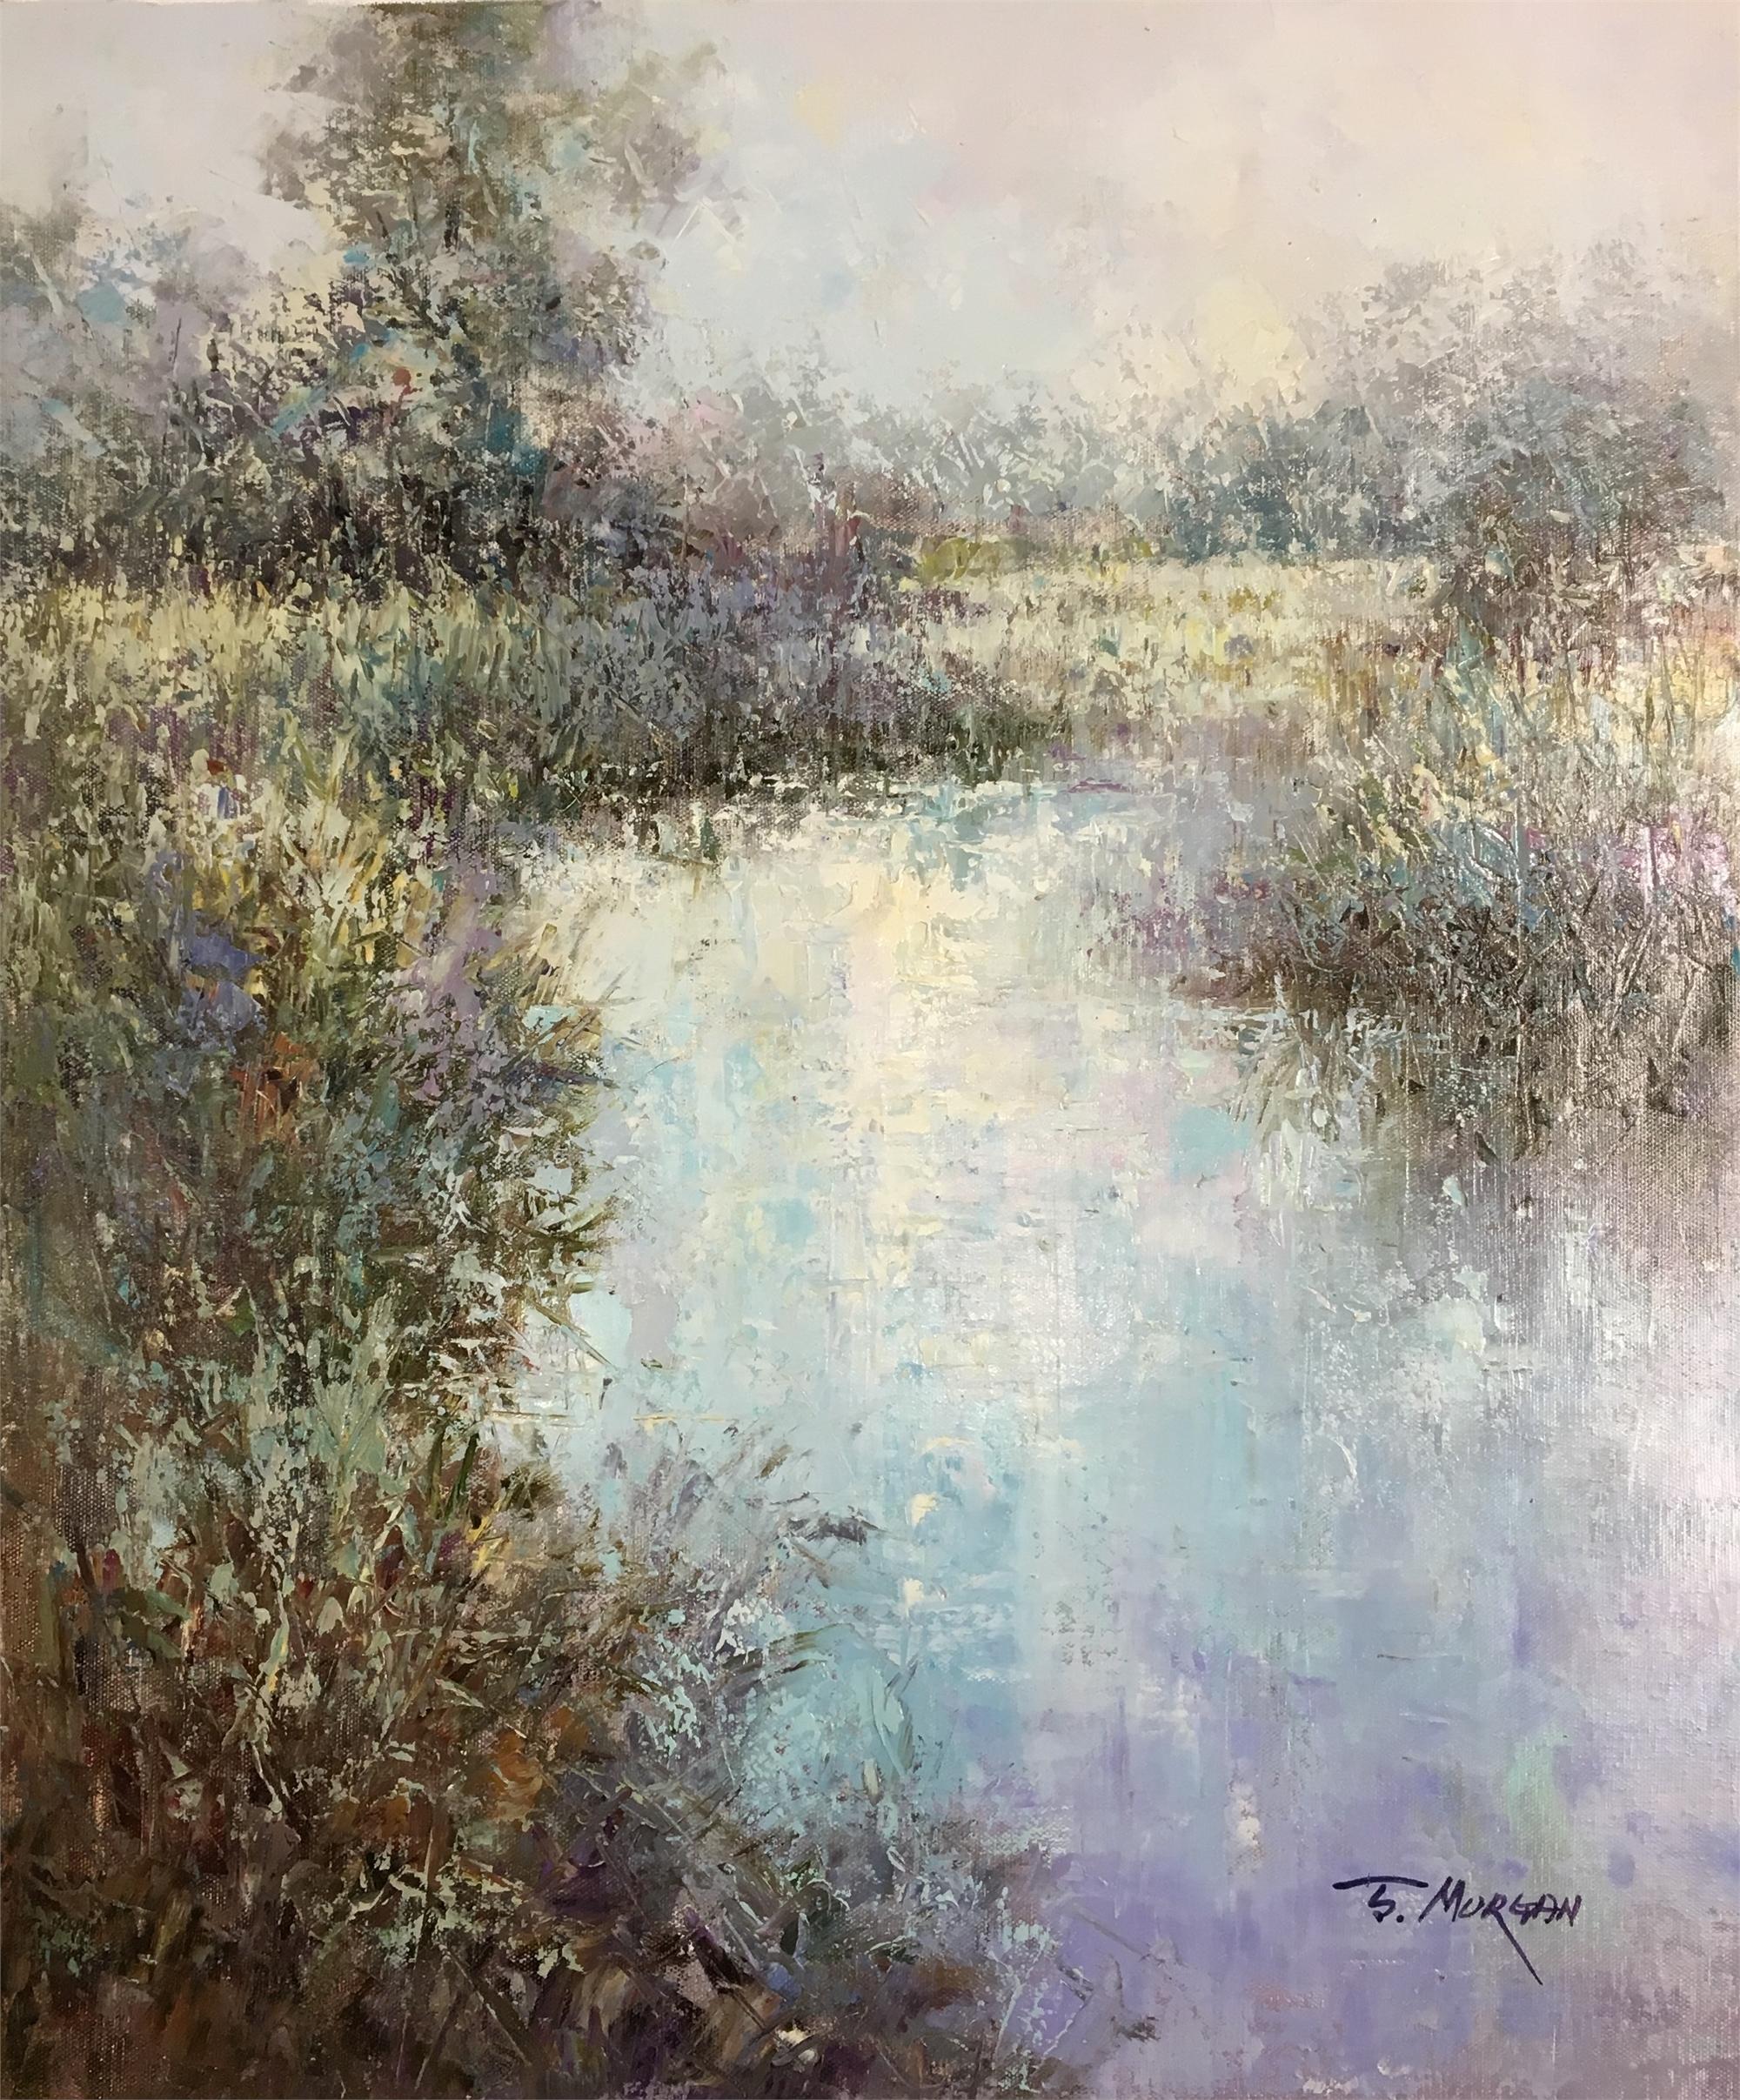 LAVENDER WATER by J MORGAN